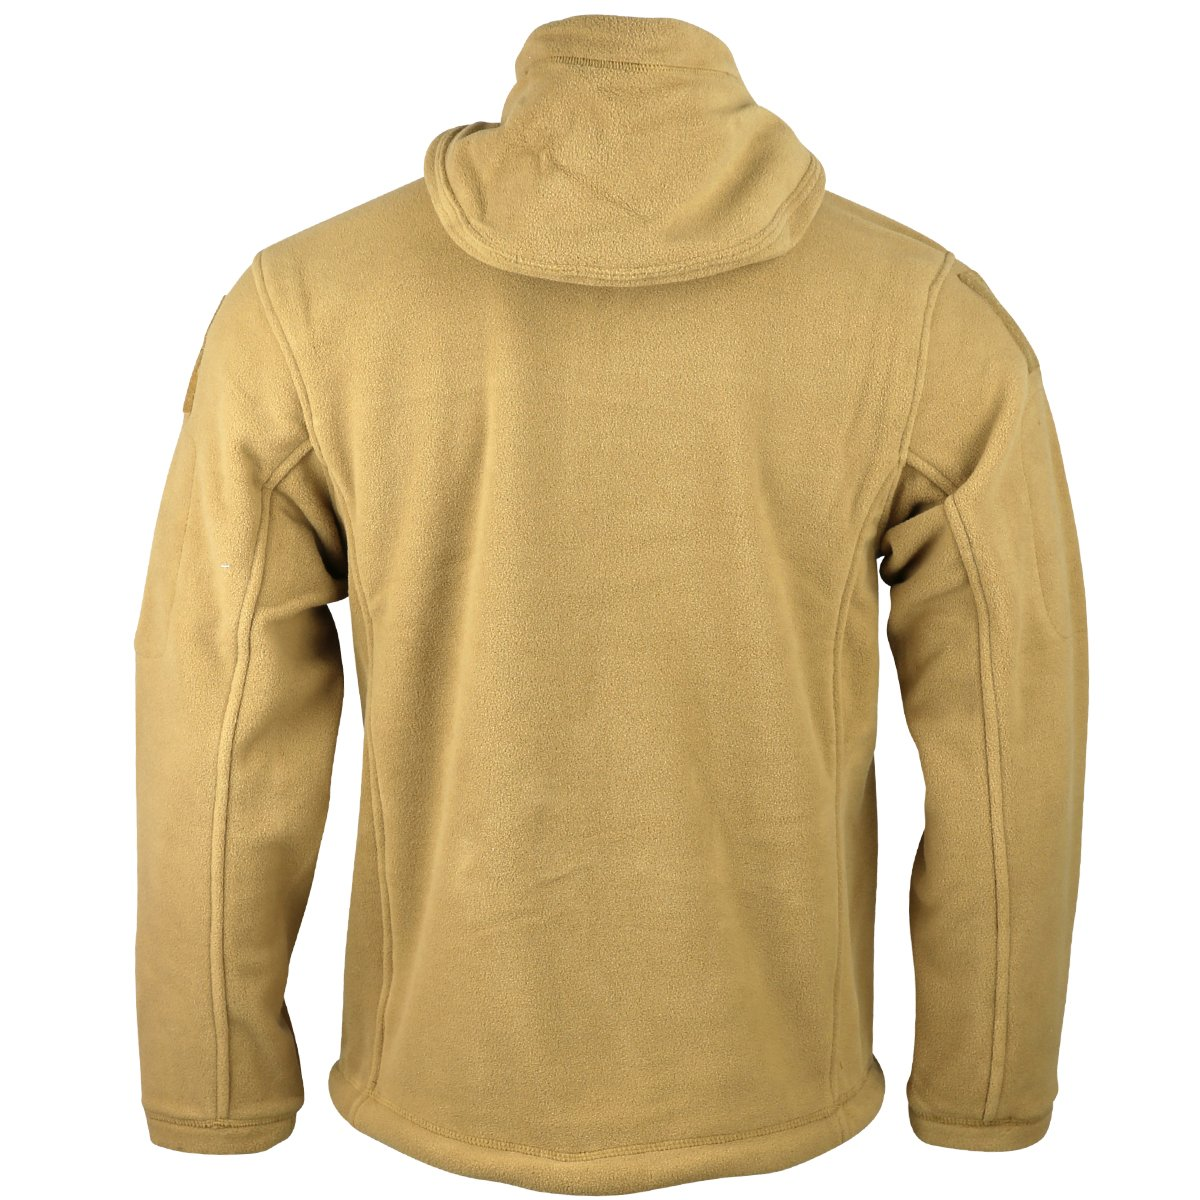 Kombat UK Recon Tactical Fleece Hoodie B01HEX523K Jacken Jacken Jacken Rich-pünktliche Lieferung b1bb67